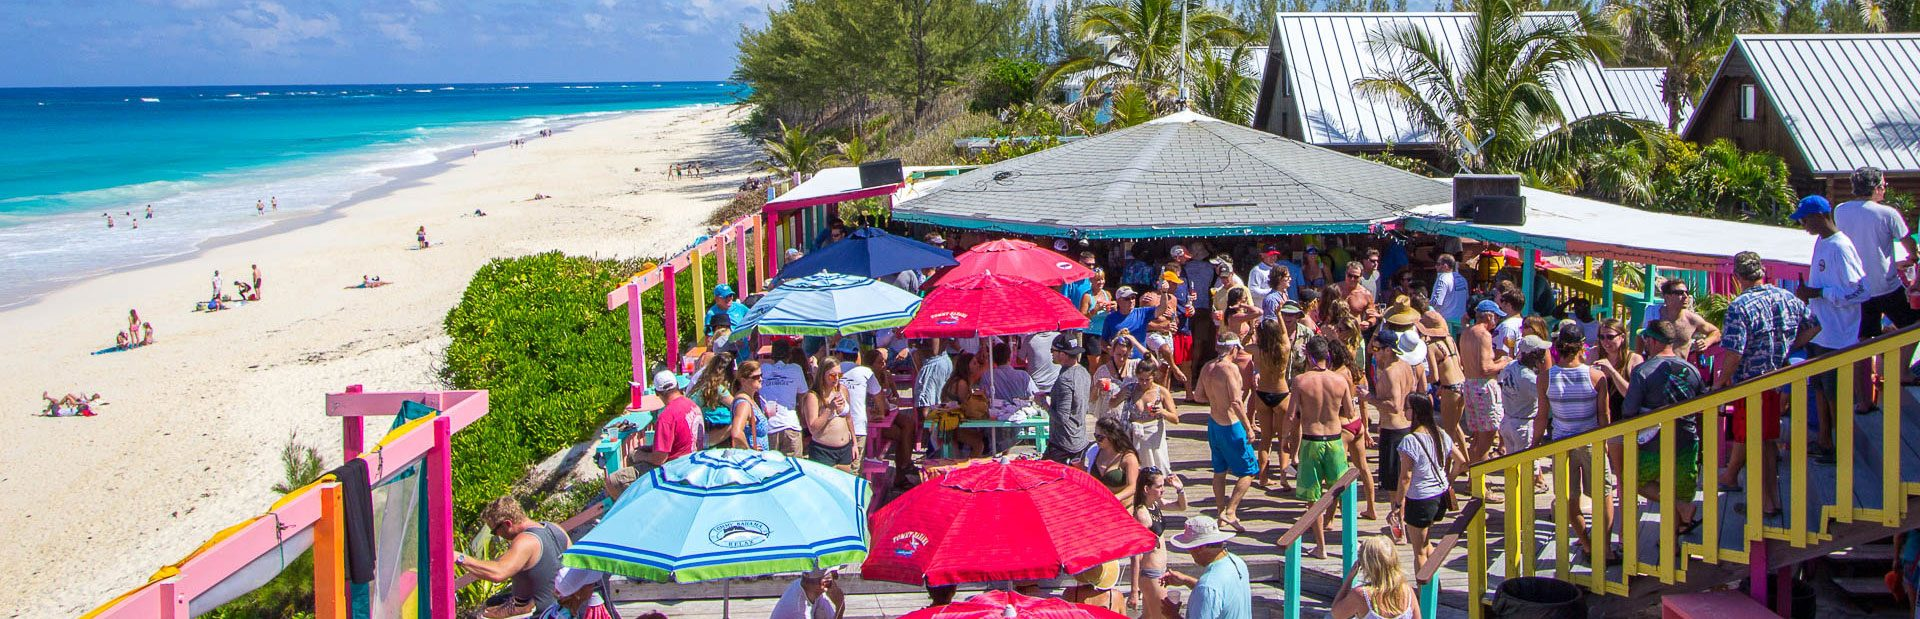 Nipper's Beach Bar & Grill Image 1